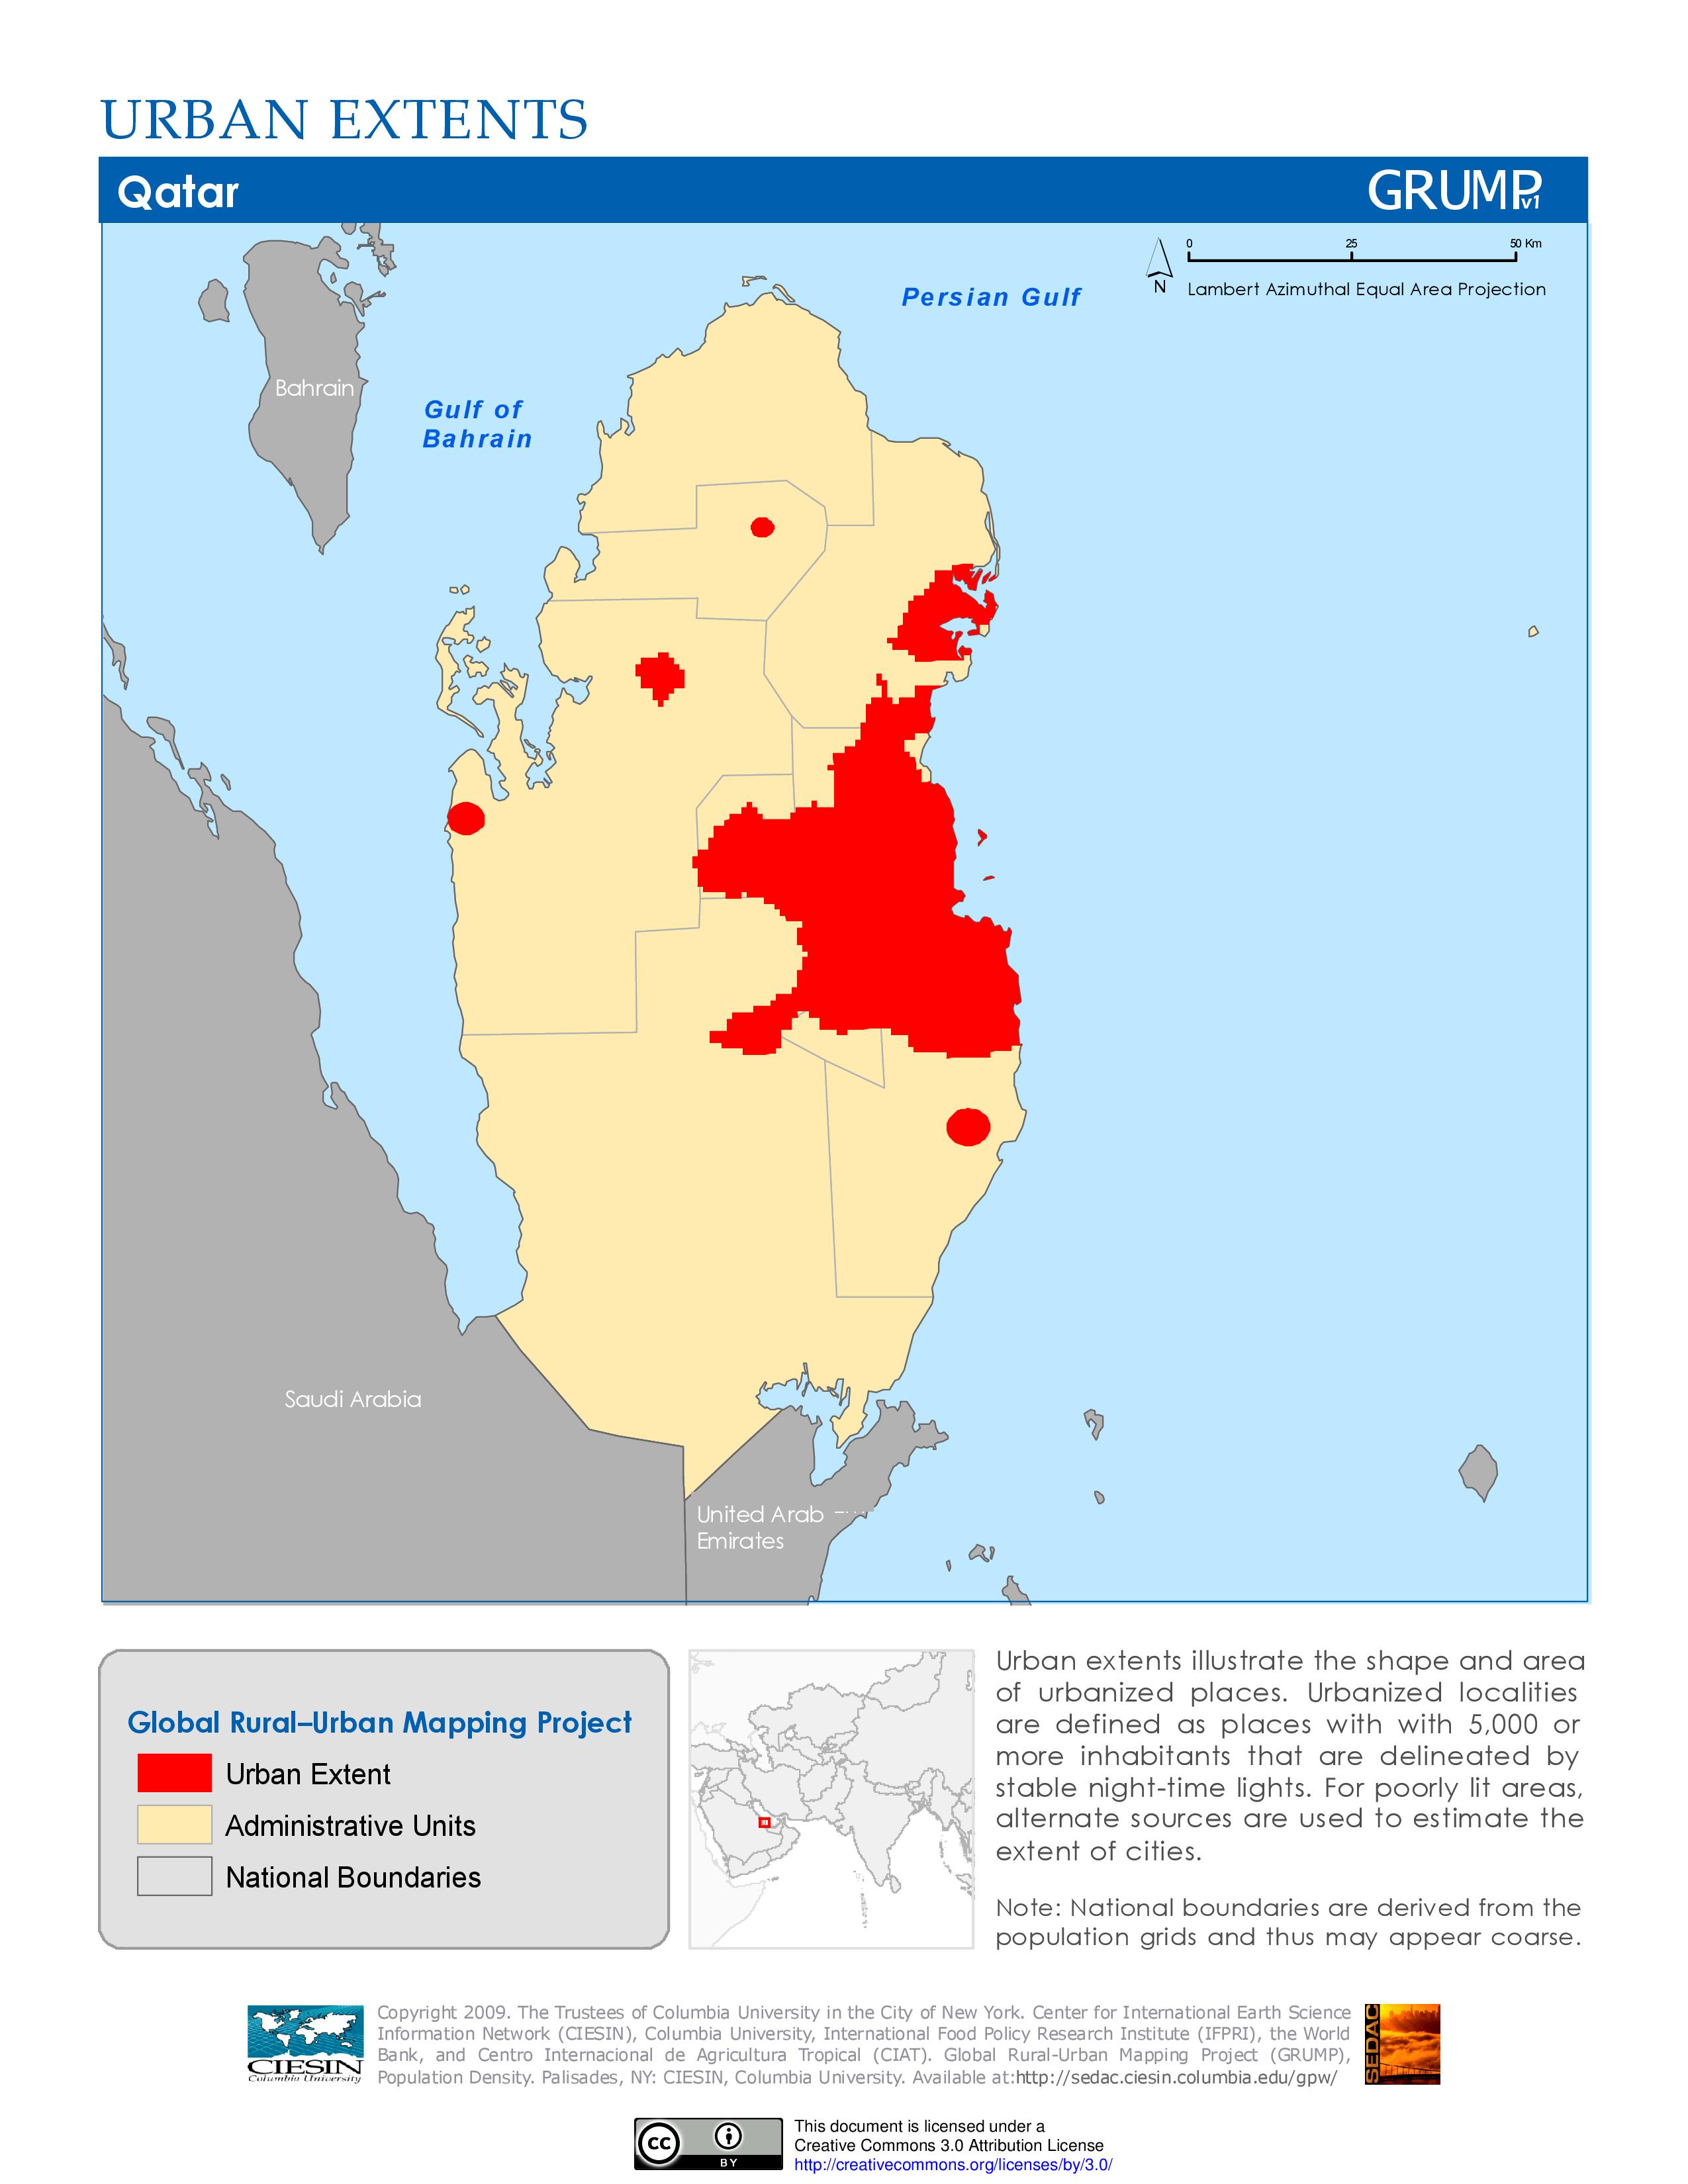 Urban extents of Qatar | Urban mapping, Urban, The unit on italy map area, algeria map area, cape verde map area, jamaica map area, bangladesh map area, kuwait map area, lebanon map area, puerto rico map area, palestine map area, egypt map area, rwanda map area, syria map area, middle east map area, iceland map area, haiti map area, japan map area, albania map area, asia map area, cayman islands map area, saudi arabia map area,